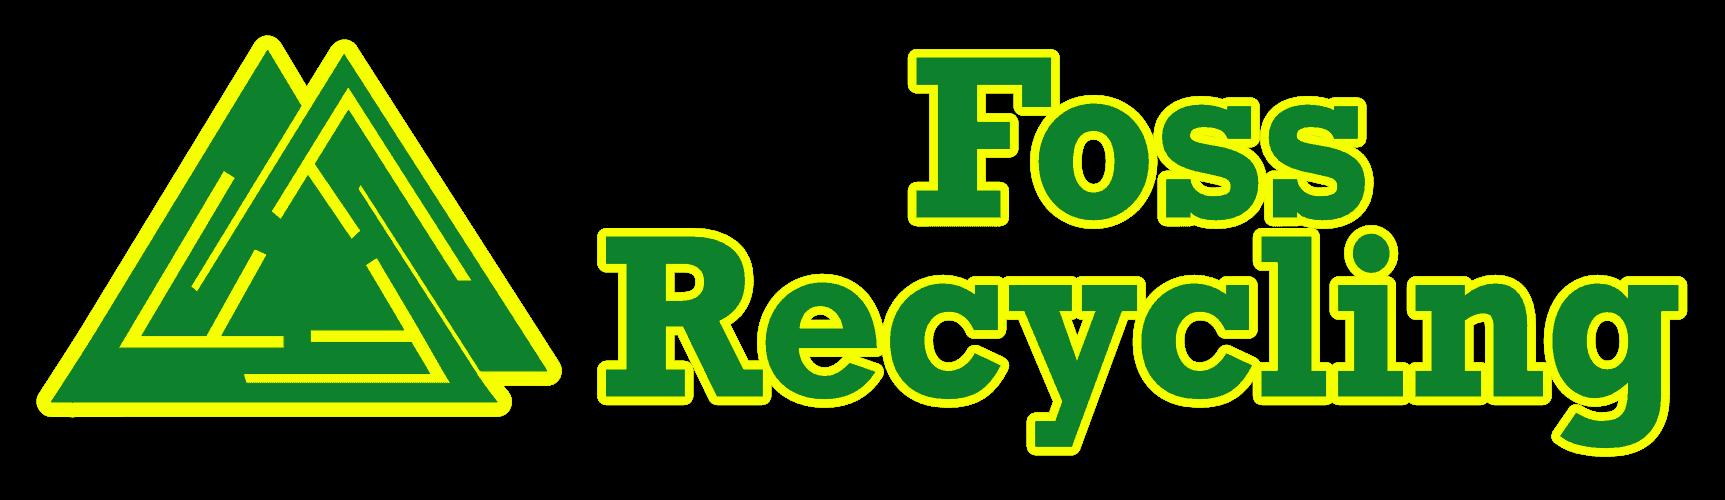 Foss Logo | Used Auto Parts Junkyards & Salvage Yards In Virginia & North Carolina | Locations In Winston-Salem, Chesapeake & More